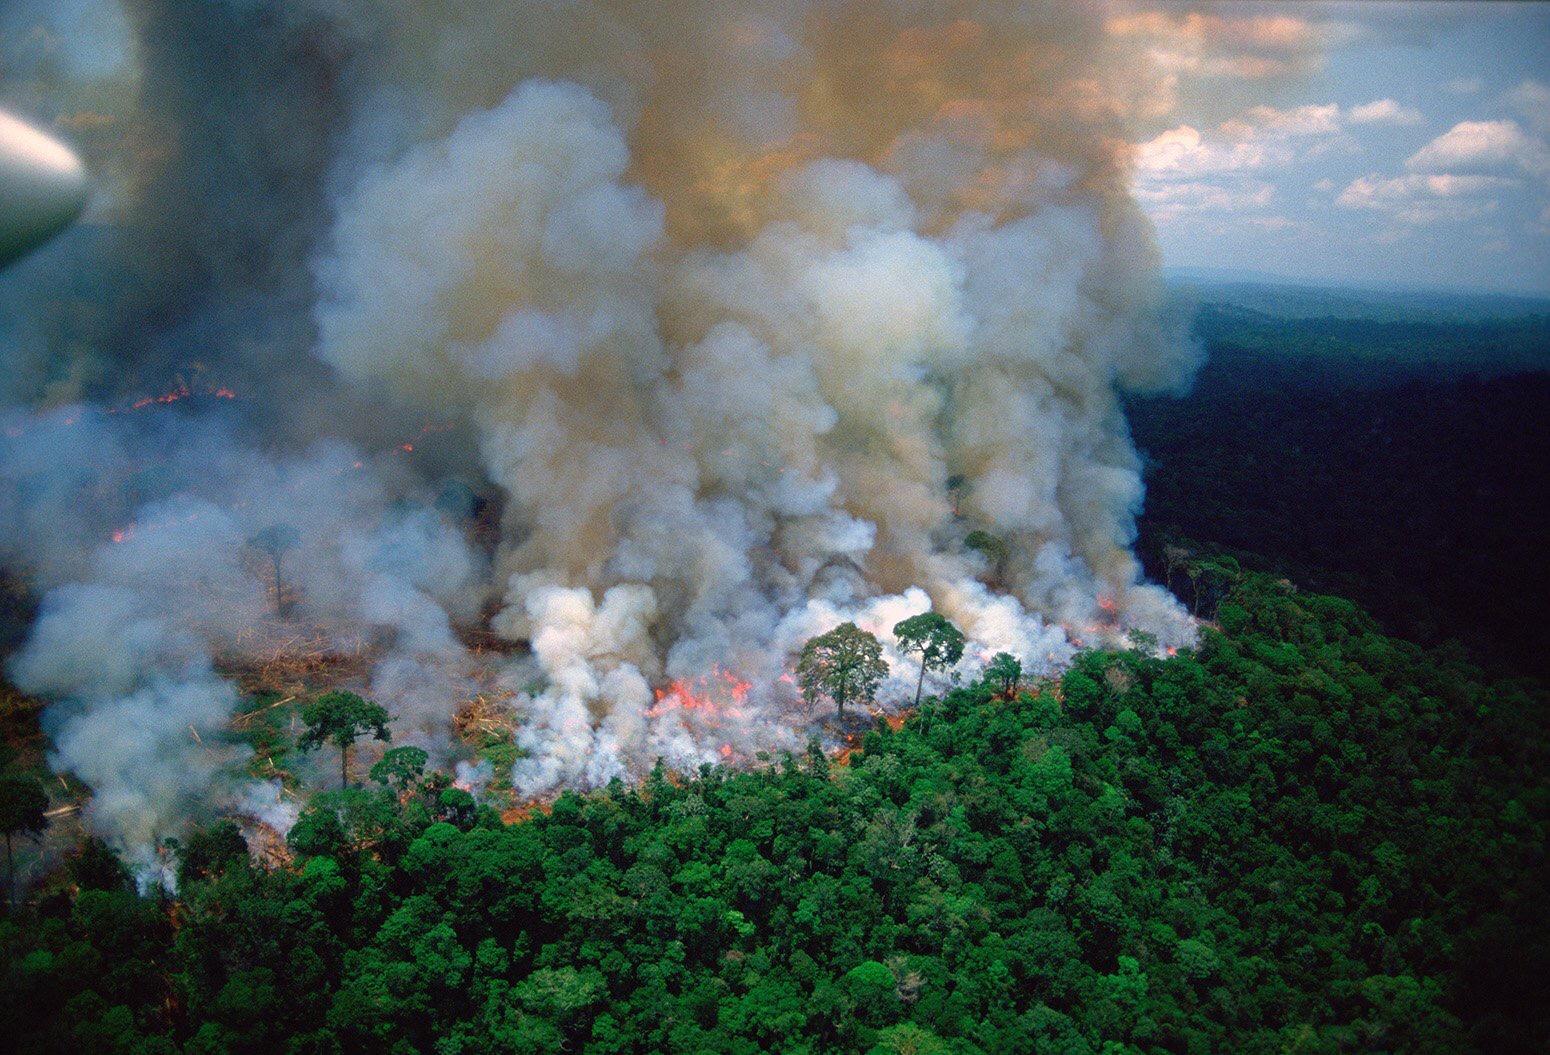 Brazil's President Bolsonaro claims NGOs may be burning the Amazon